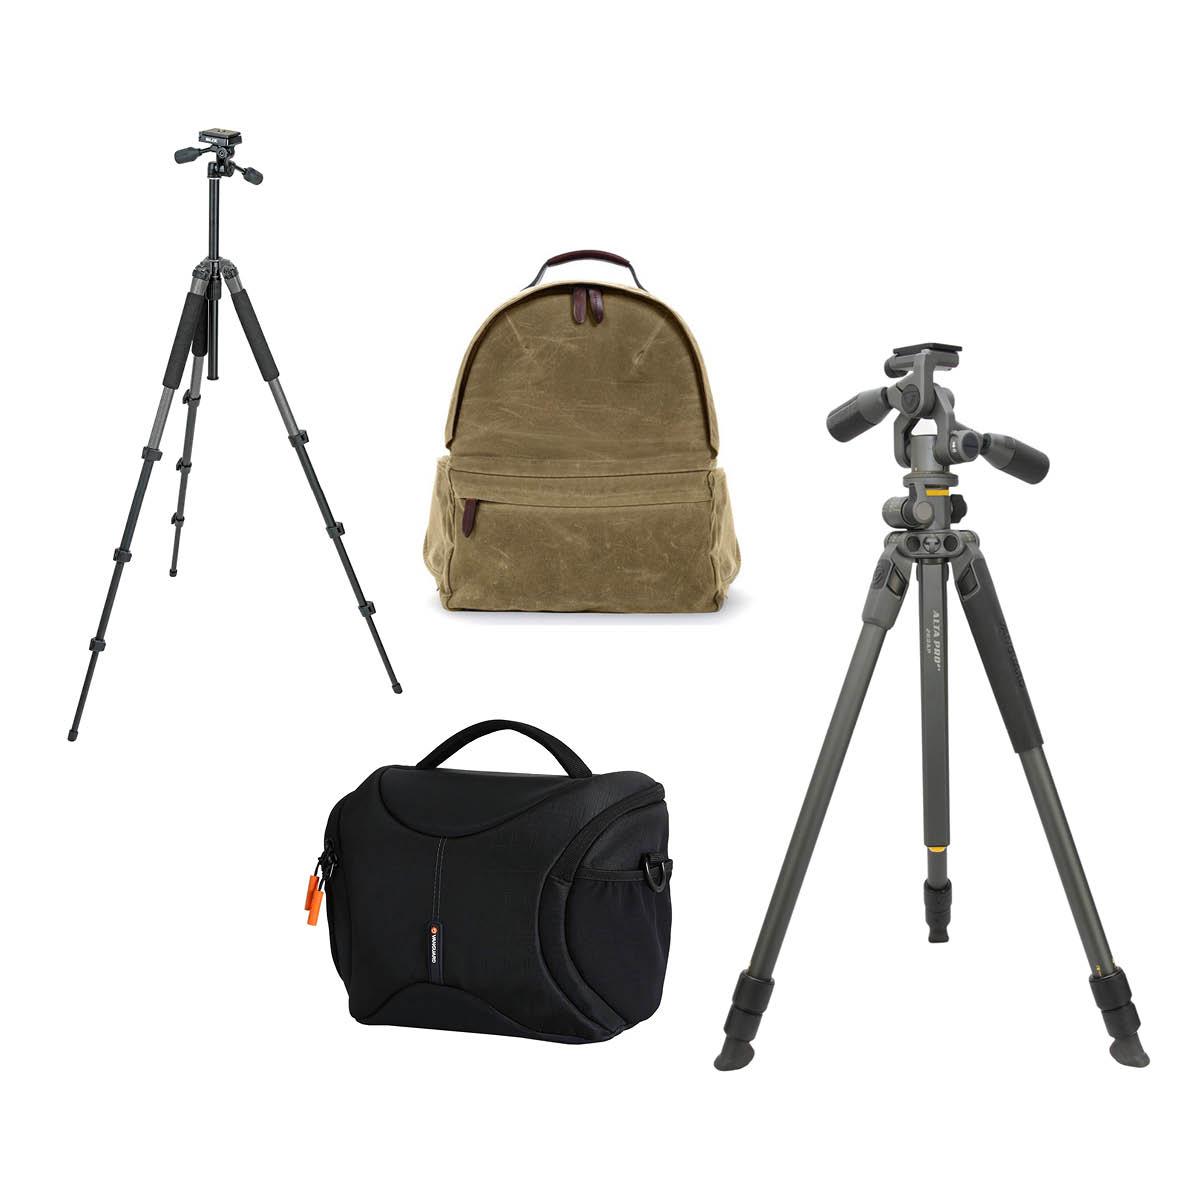 Portrait - Sponsored by ProfotoFirst: Ona Bolton Backpack, worth $799Second: Slick Sprint Tripod and Vanguard Oslo 25 Shoulder Bag Black, worth $350Third: Vanguard Alta Pro 2+ 263AP Aluminium Tripod, worth $280